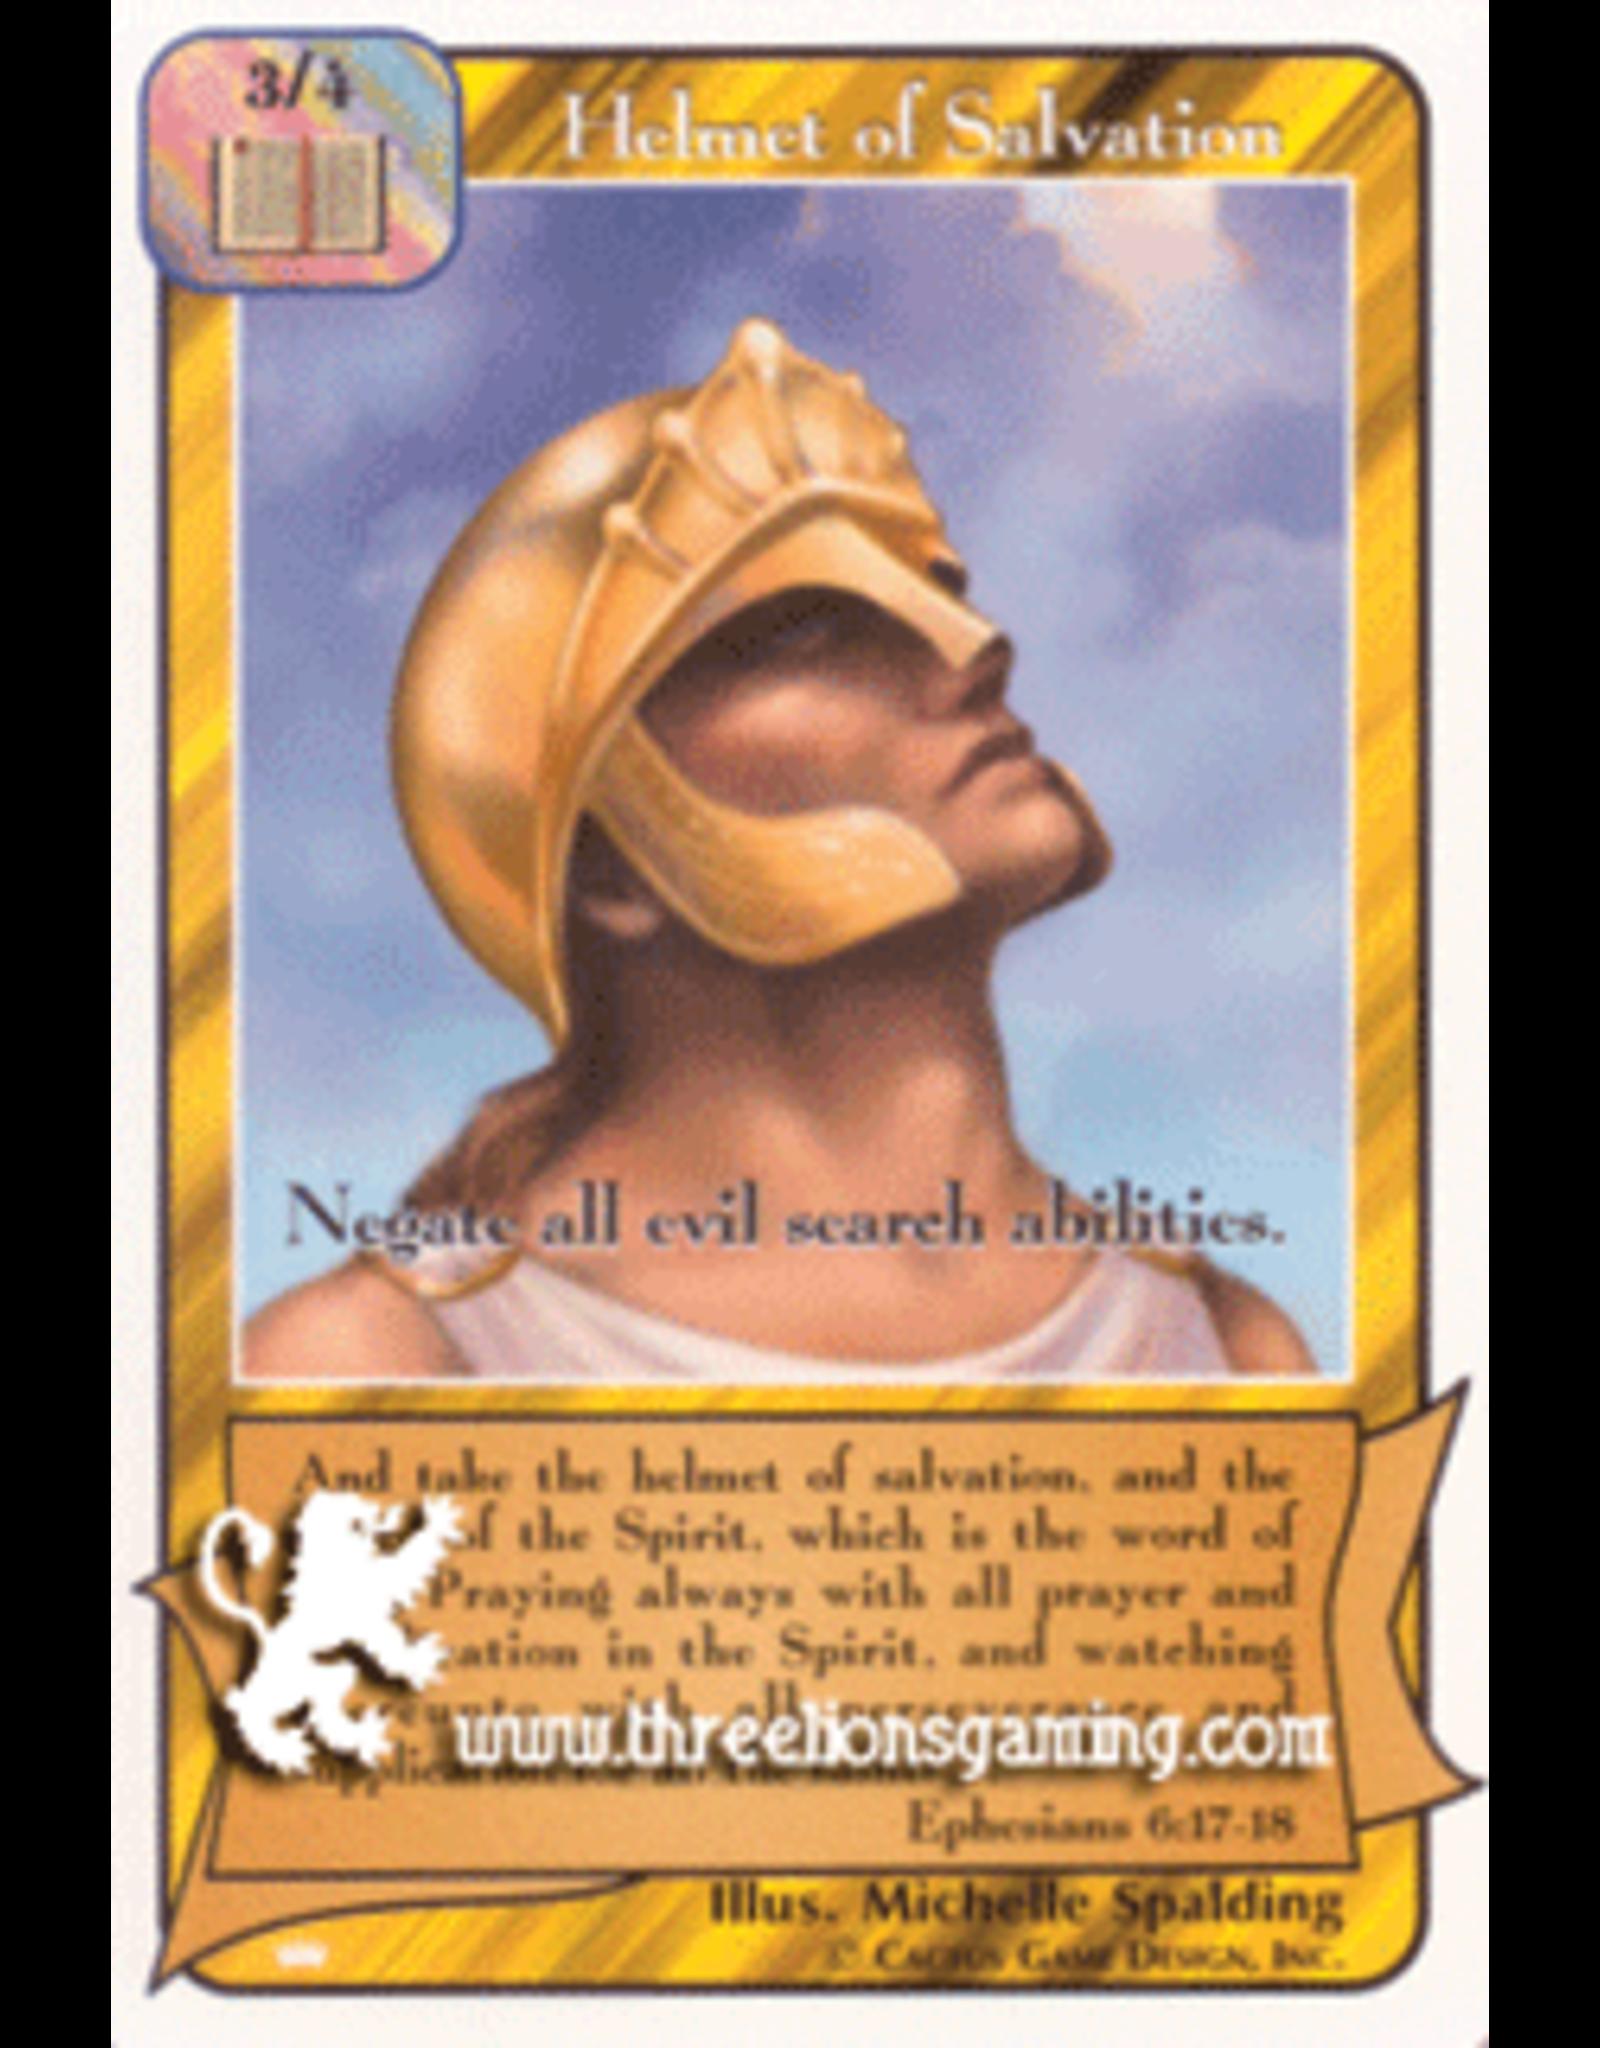 Ki: Helmet of Salvation